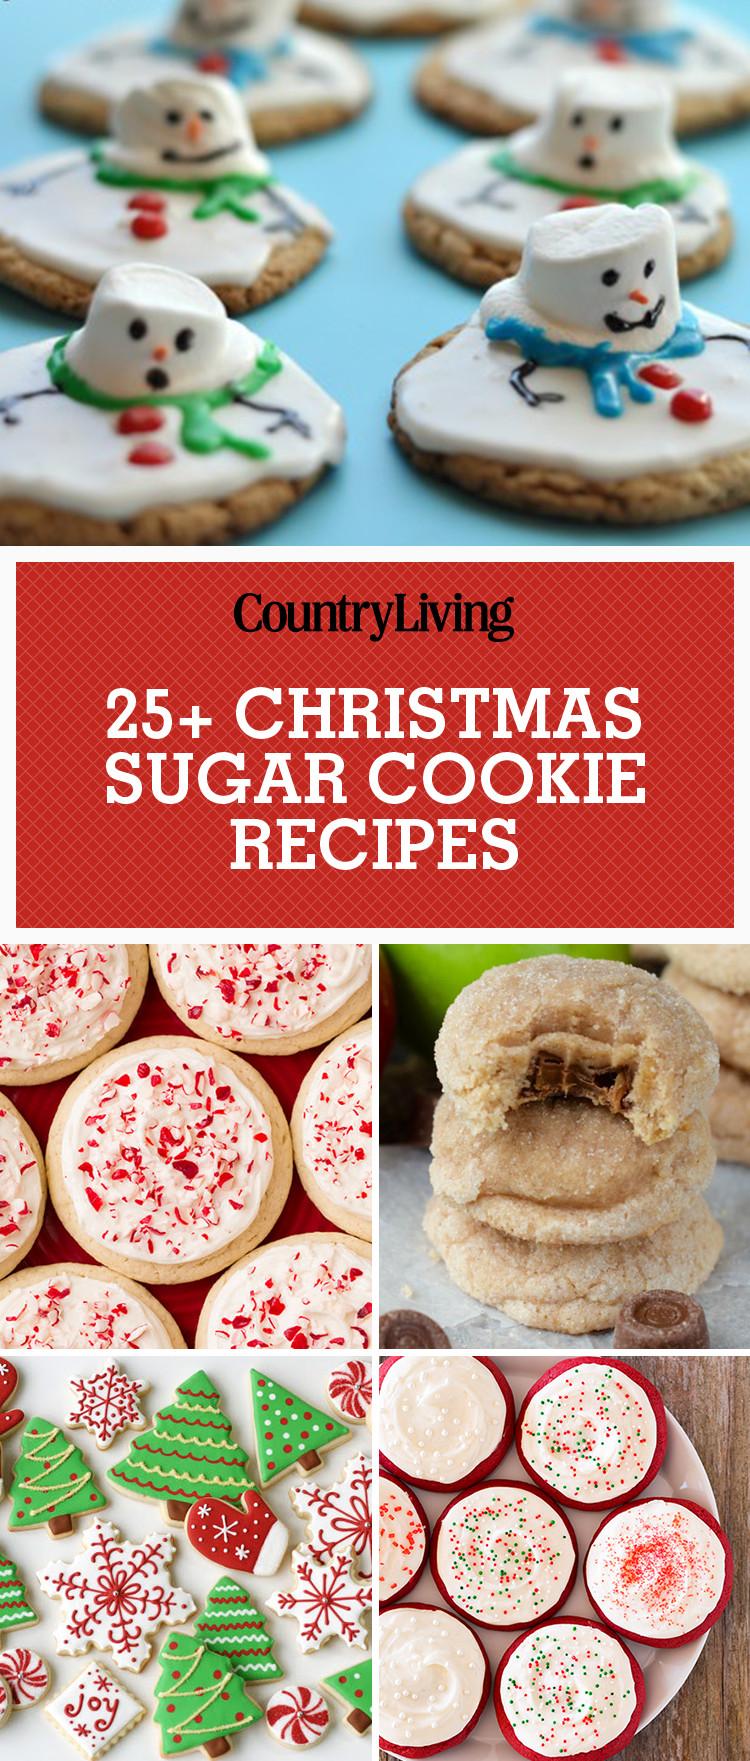 Recipe For Christmas Sugar Cookies  25 Easy Christmas Sugar Cookies Recipes & Decorating